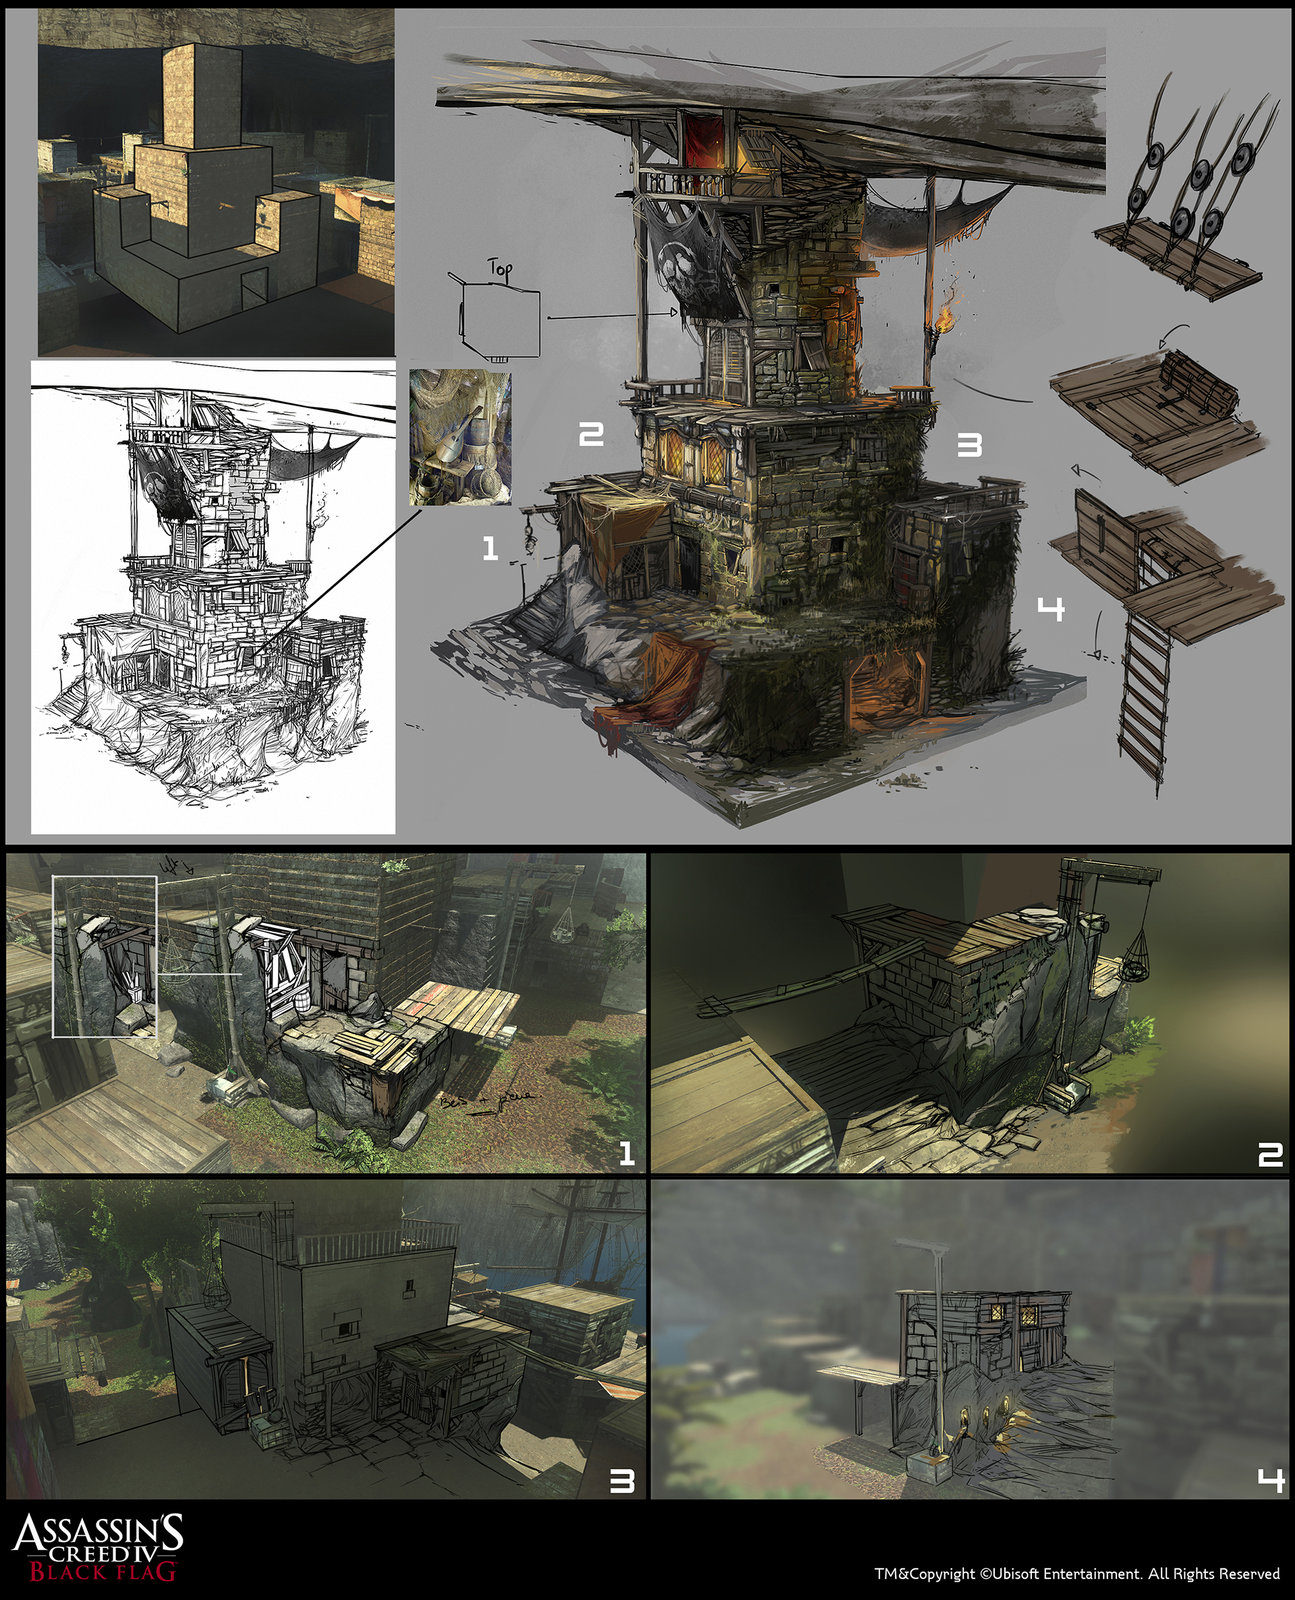 Assassin's Creed IV Black Flag - Saba Island Boss House